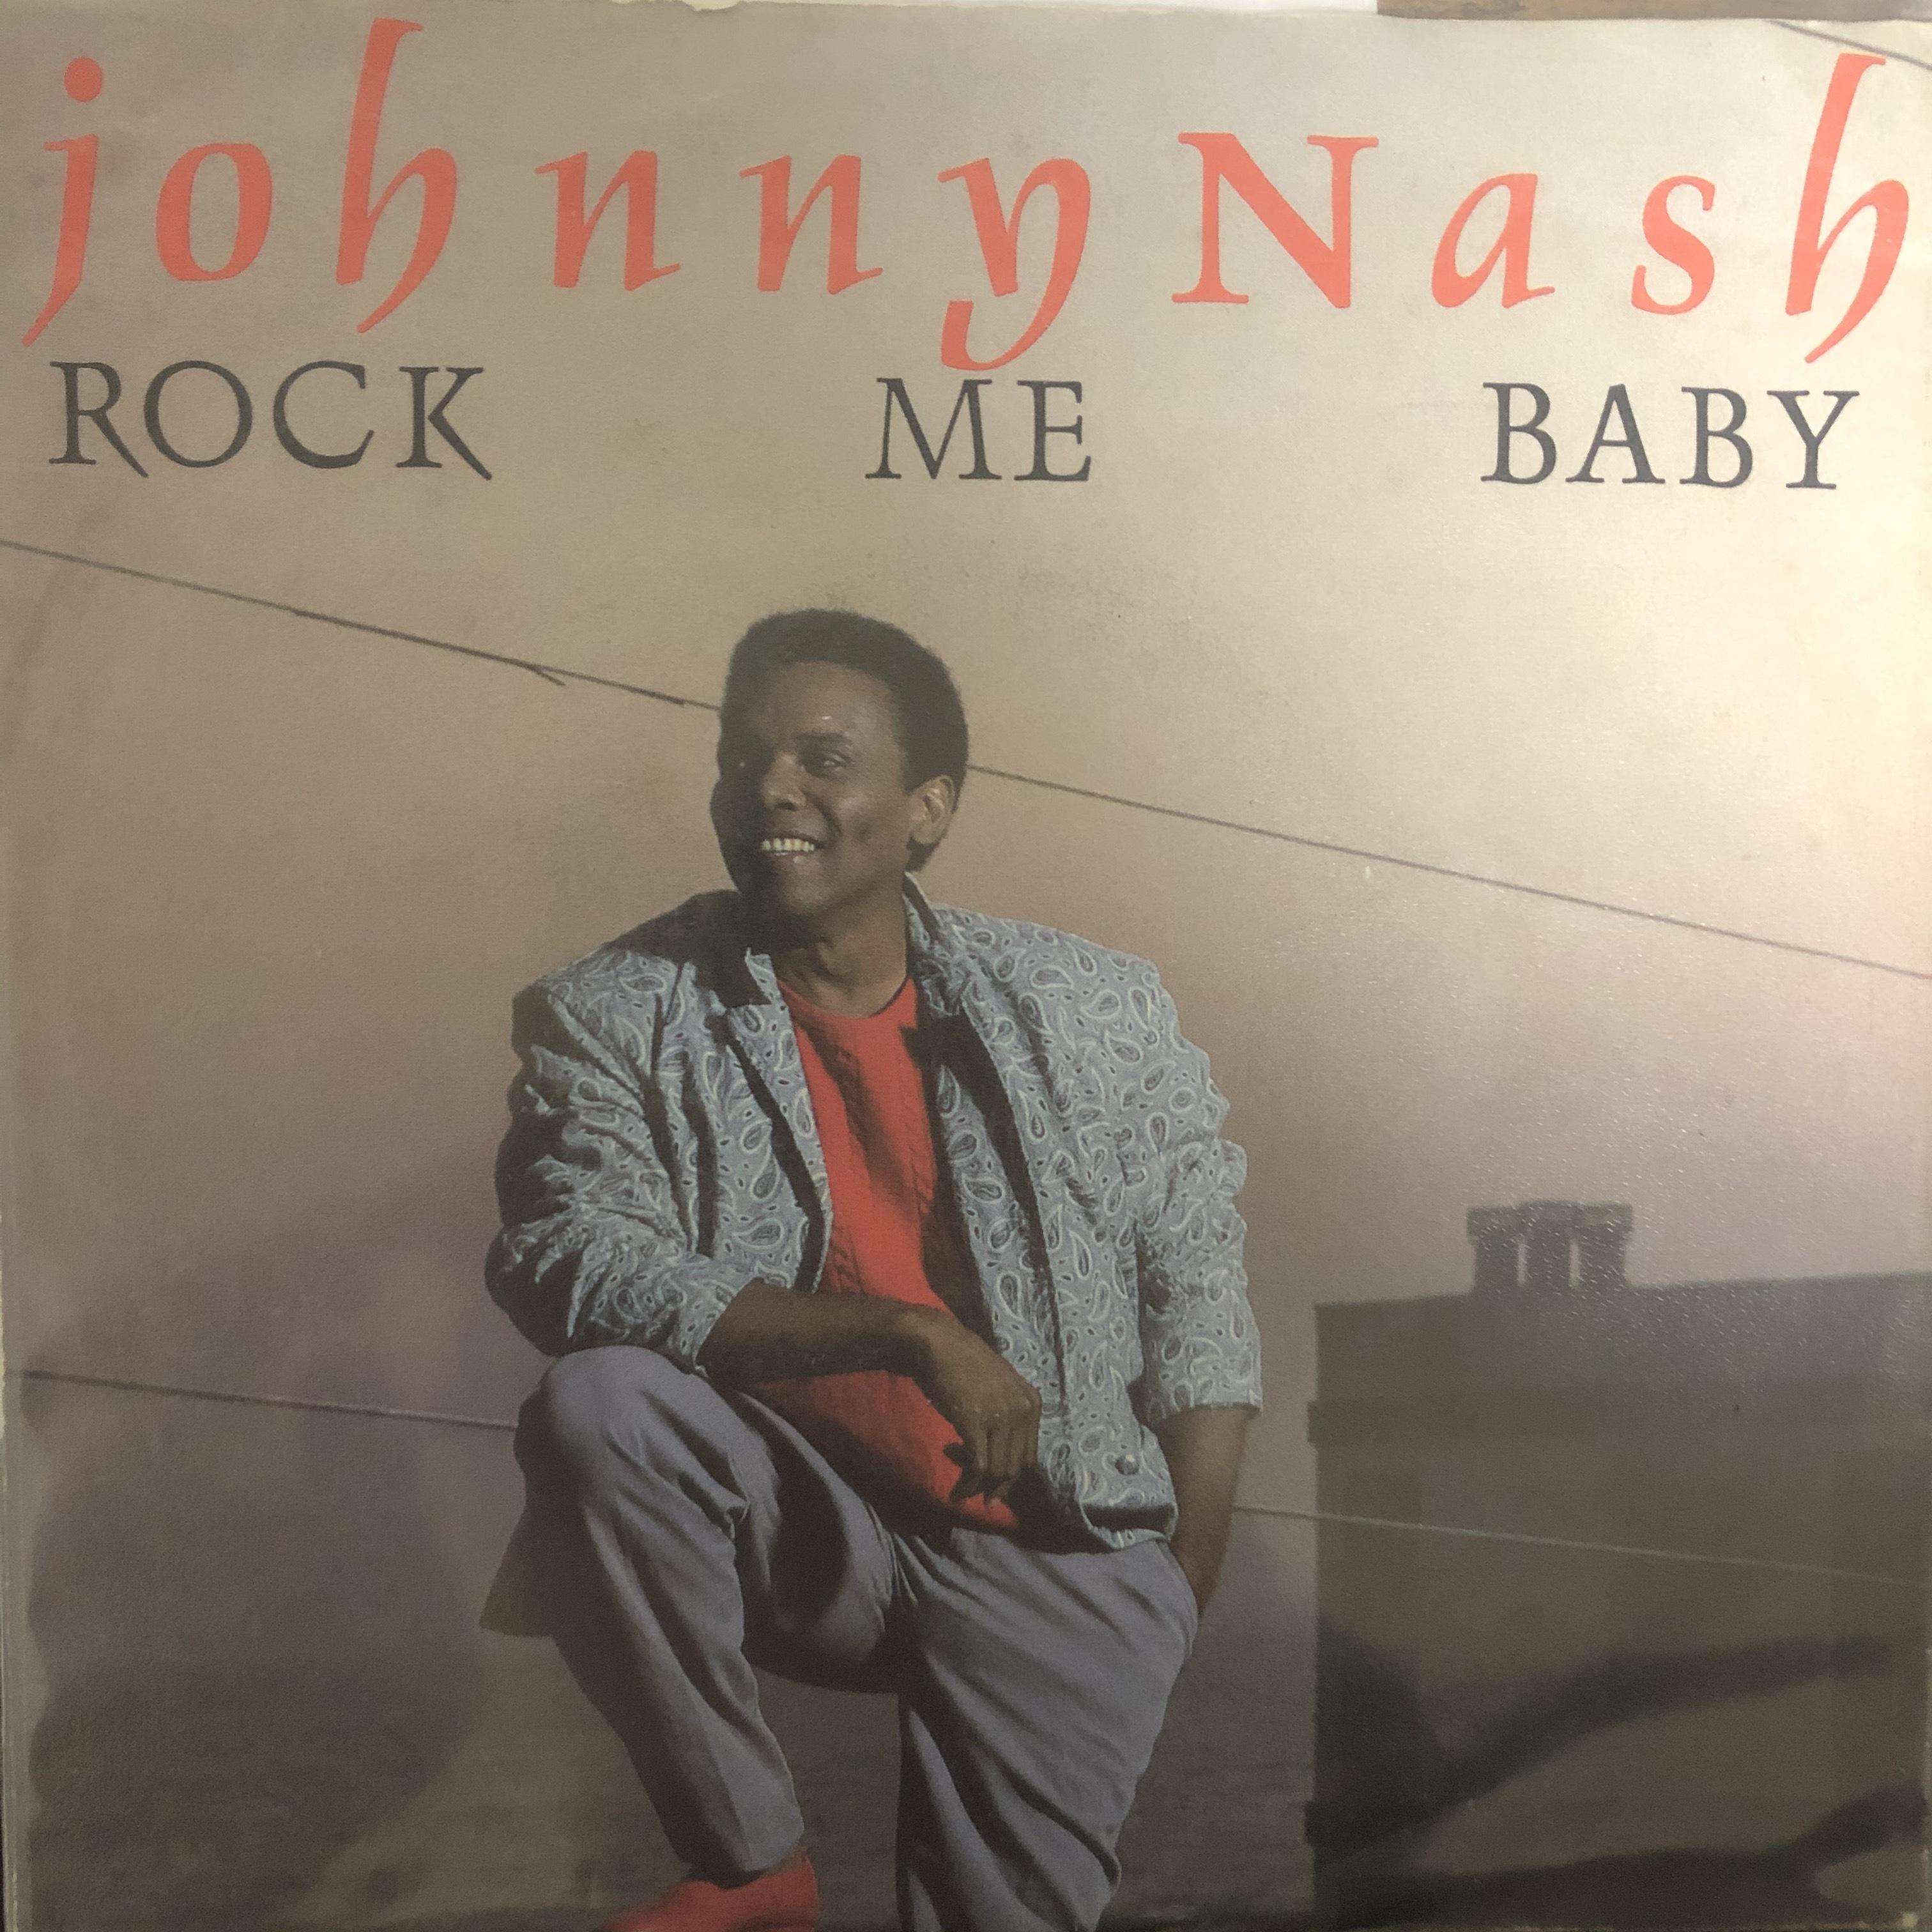 Johnny Nash - Rock Me Baby【7-20452】